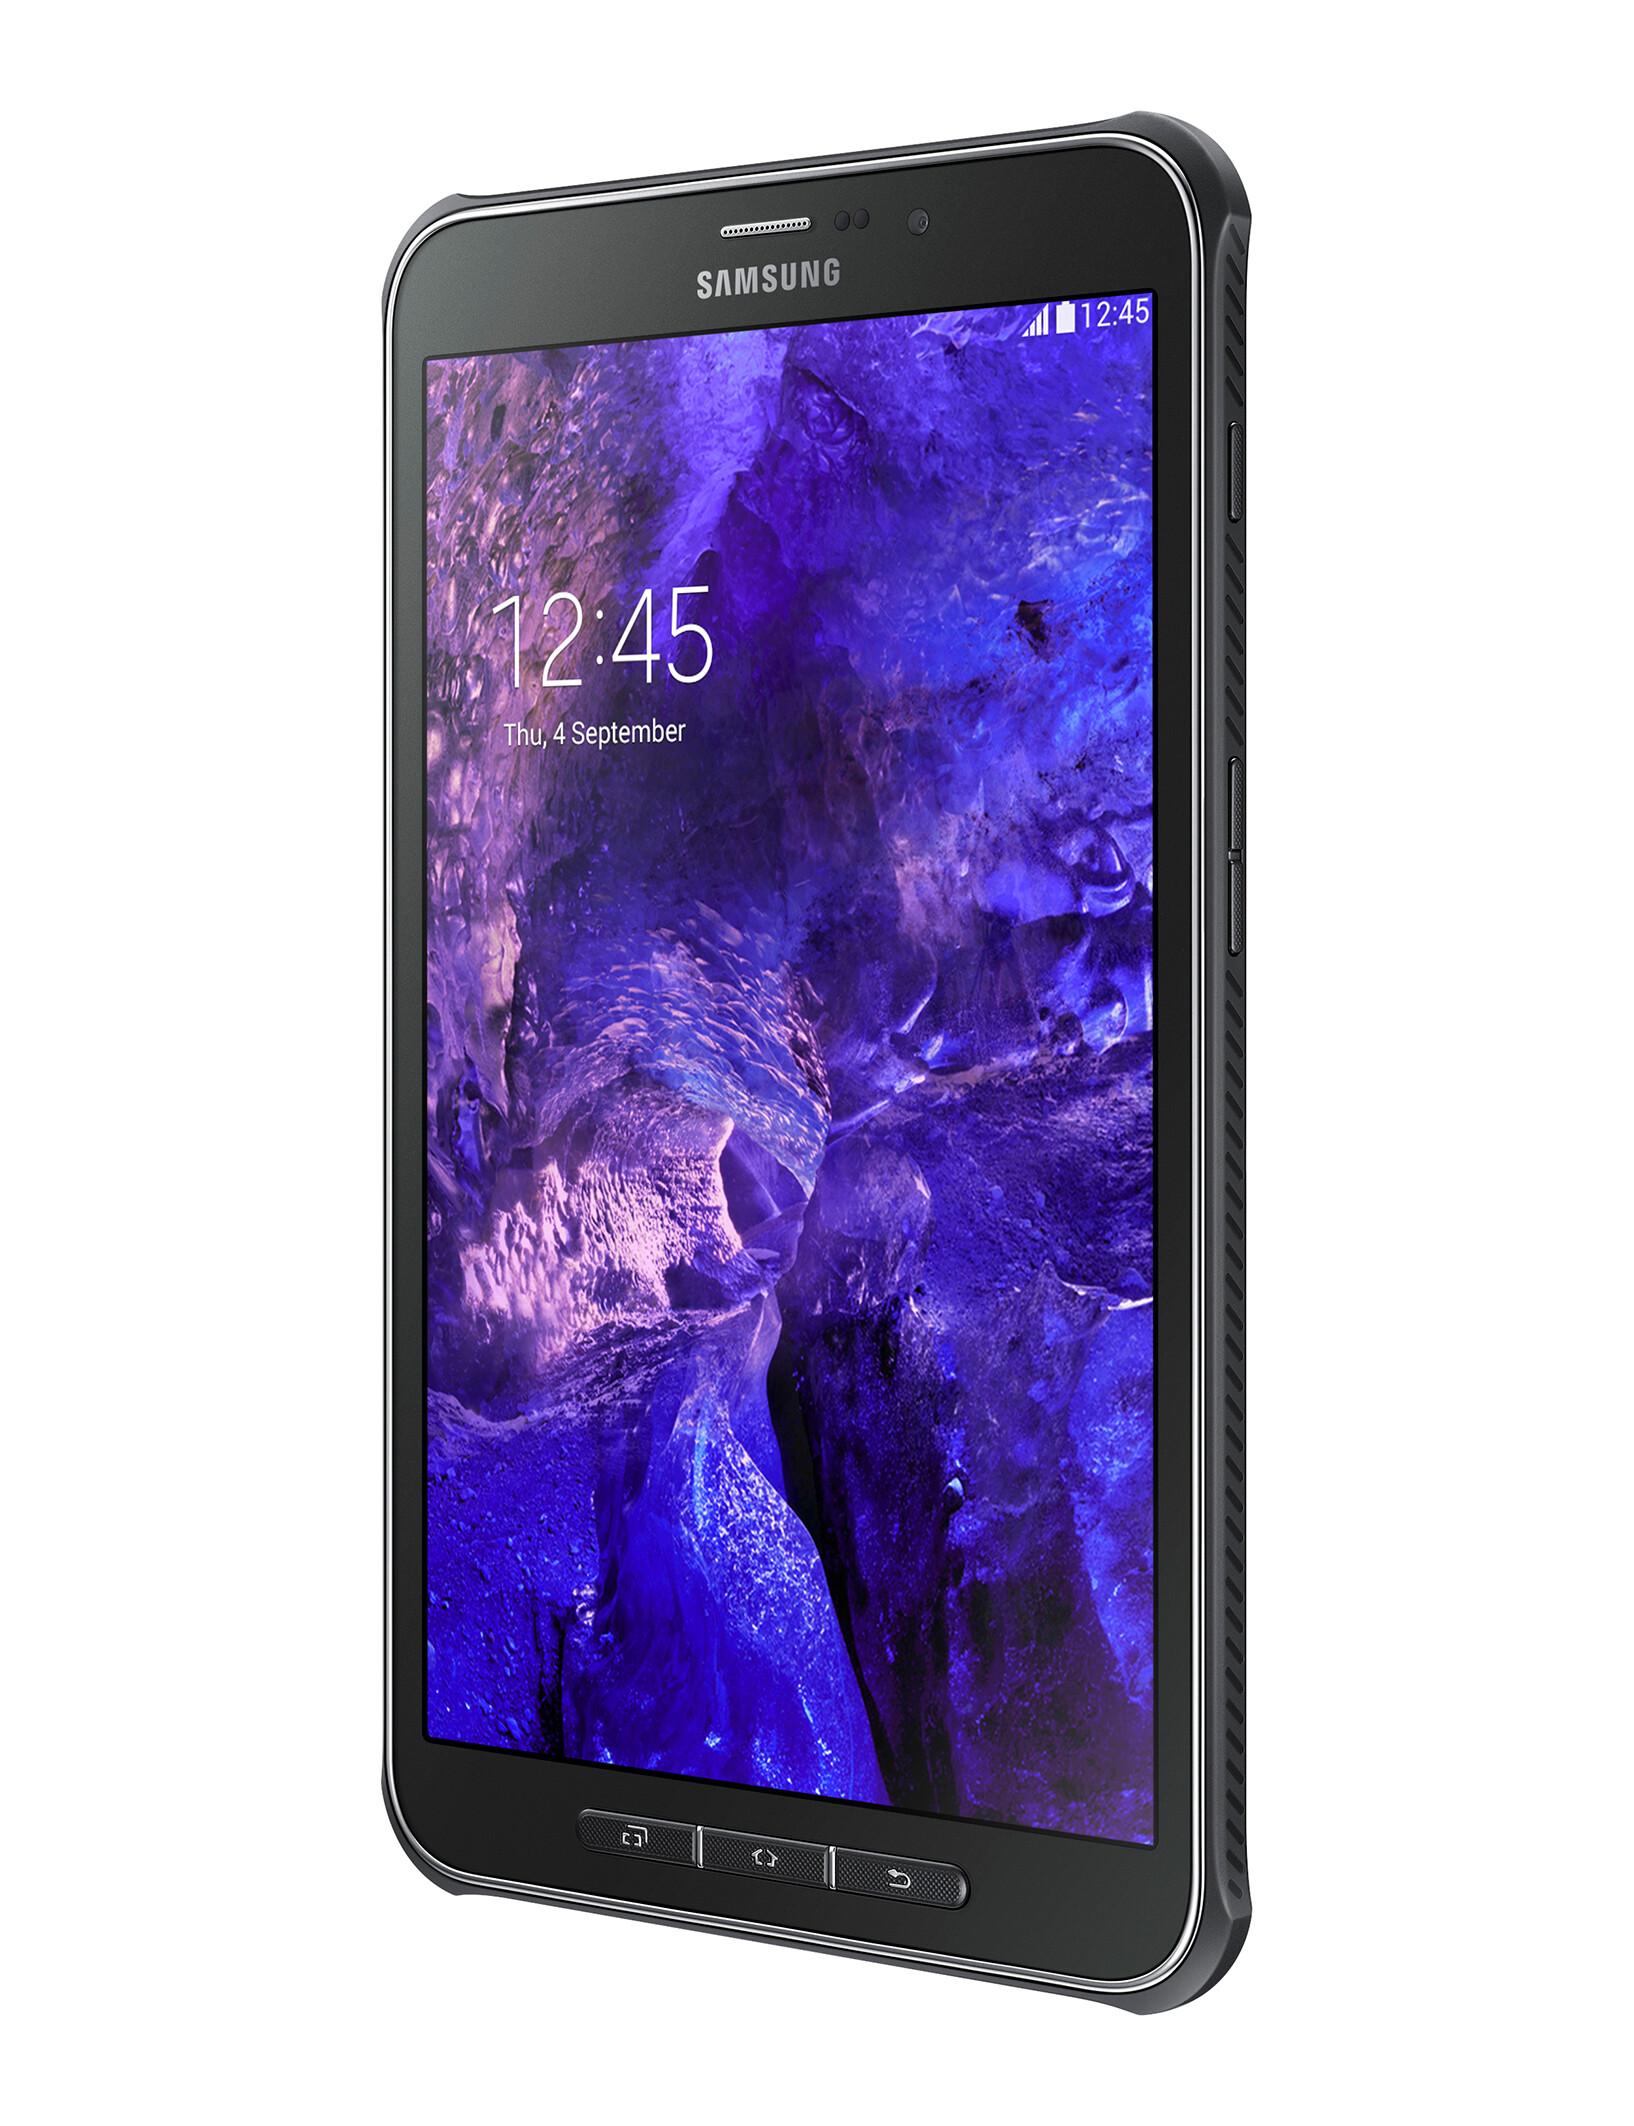 Samsung Galaxy Tab Active full specs